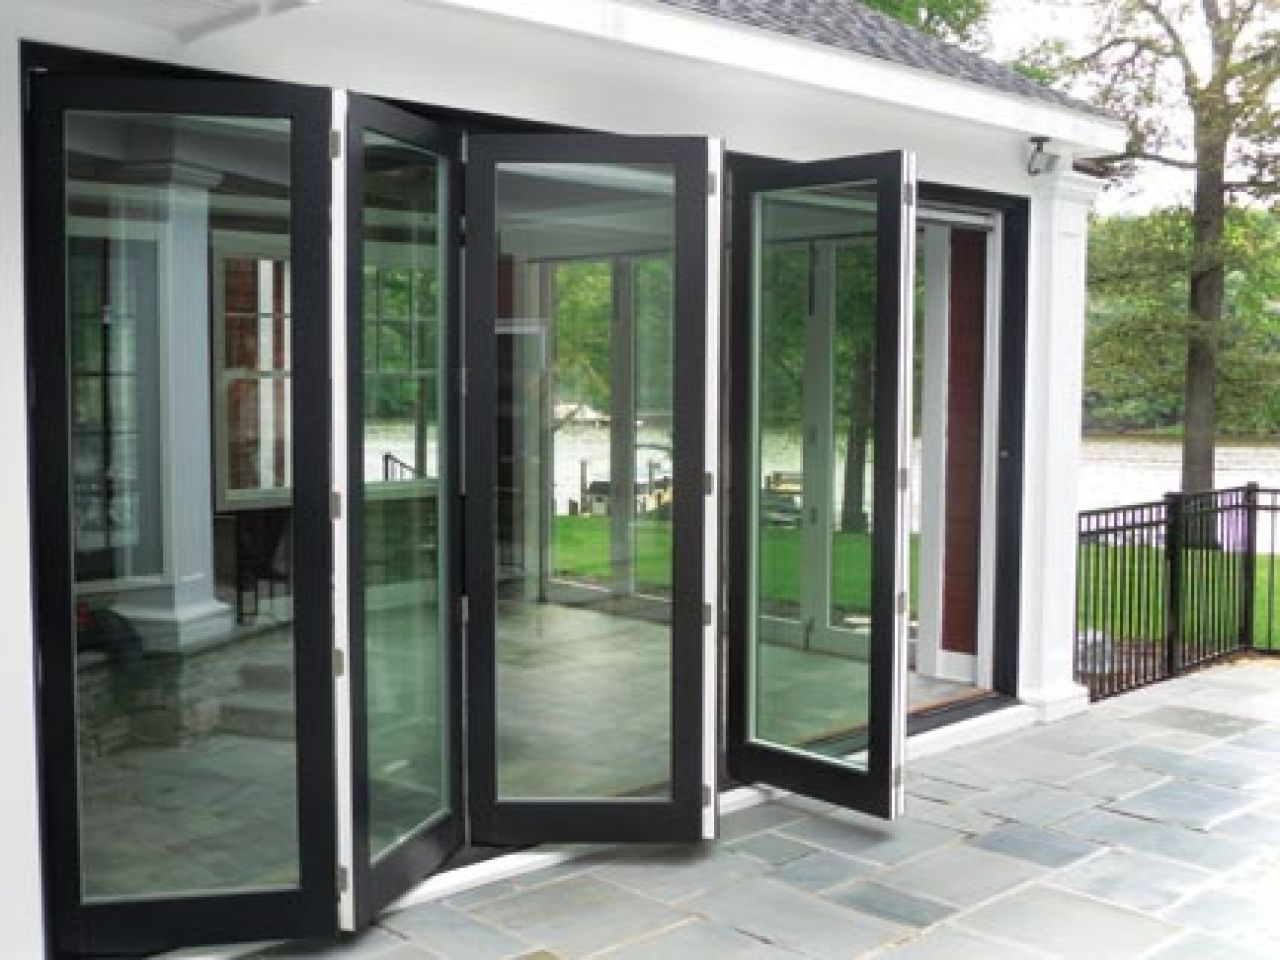 Hinges For Folding Doors Folding Sliding Patio Doors Folding Glass Patio Doors Folding Doors Patio Doors